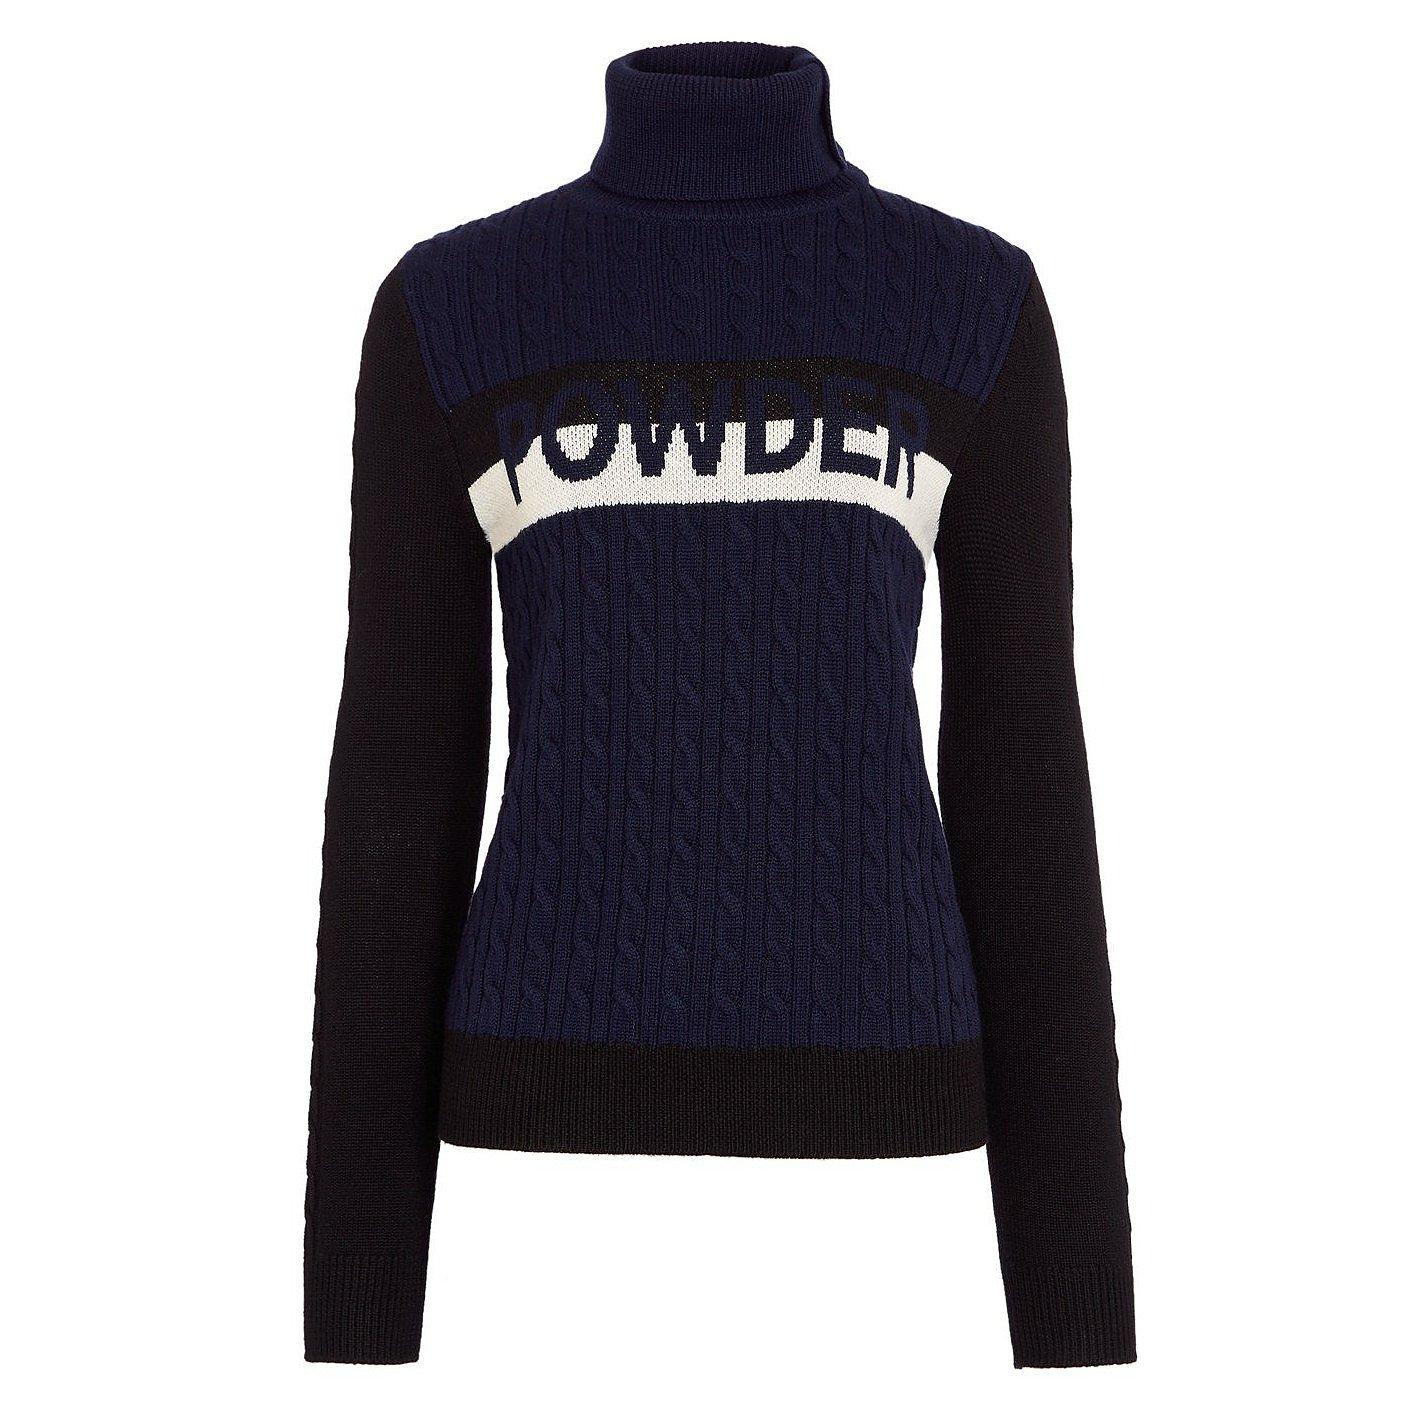 Perfect Moment Super Stripes Powder Turtle-Neck Sweater